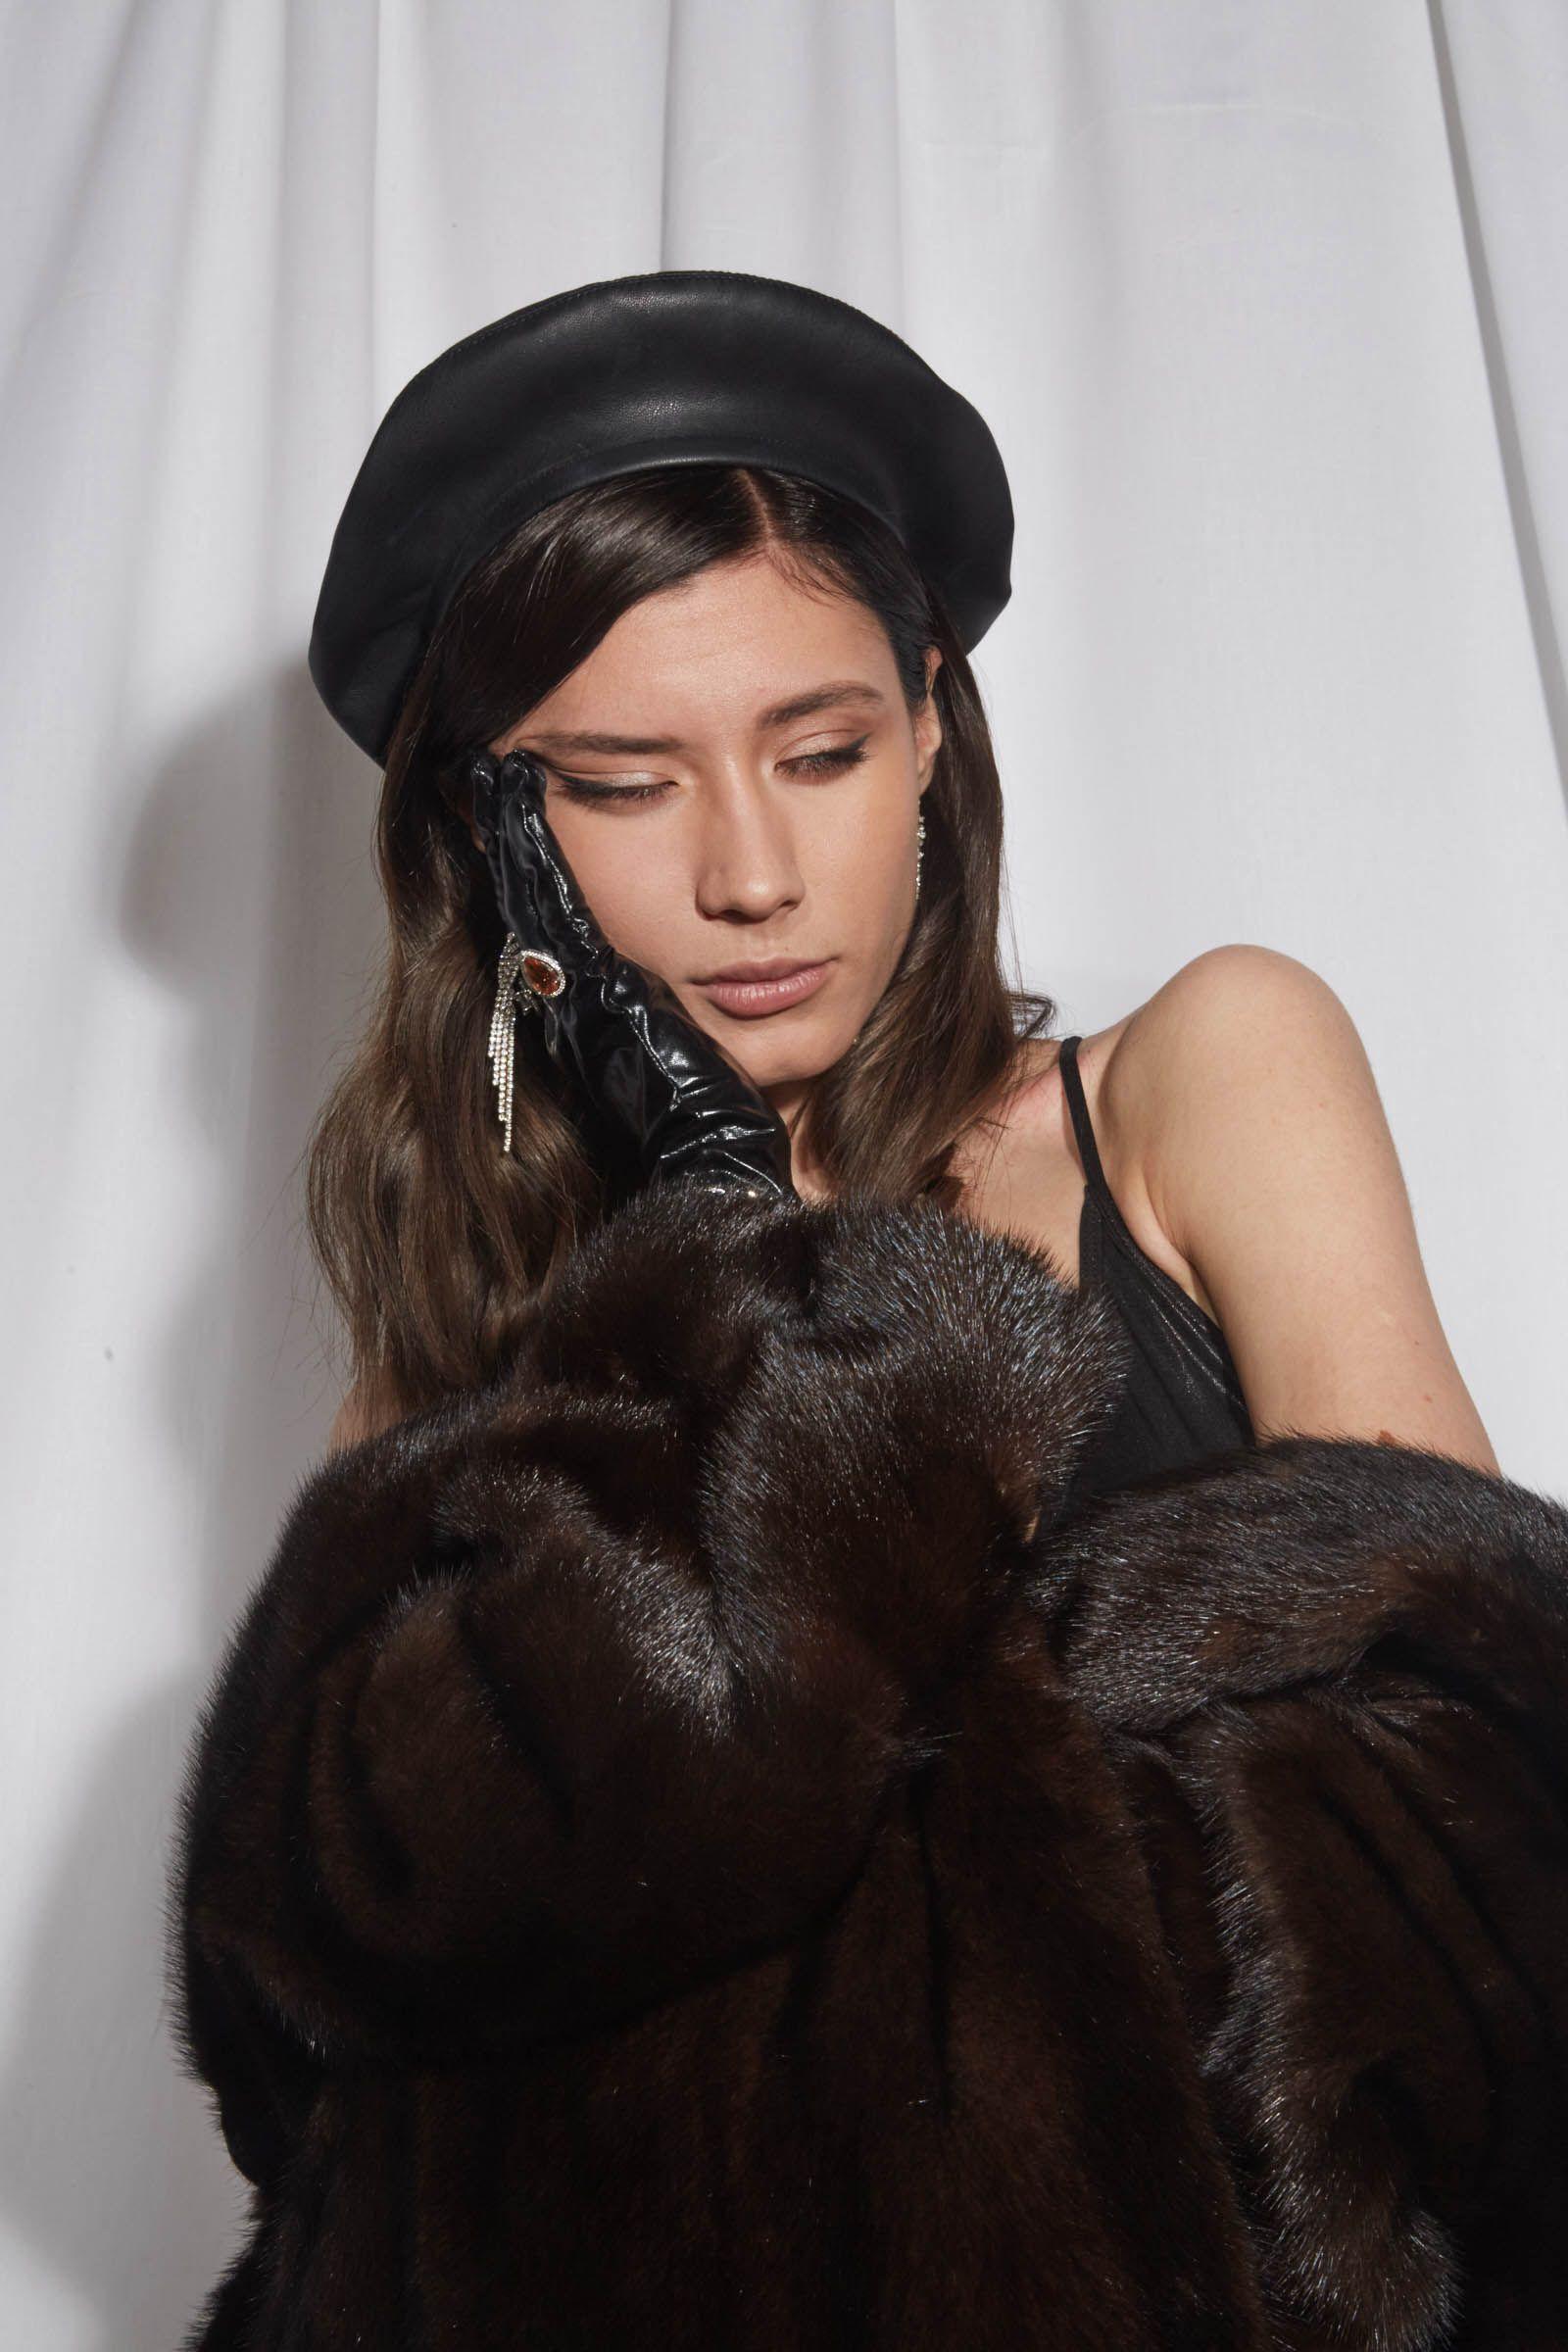 ALEXA Black eco leather beret 0e69f217f03